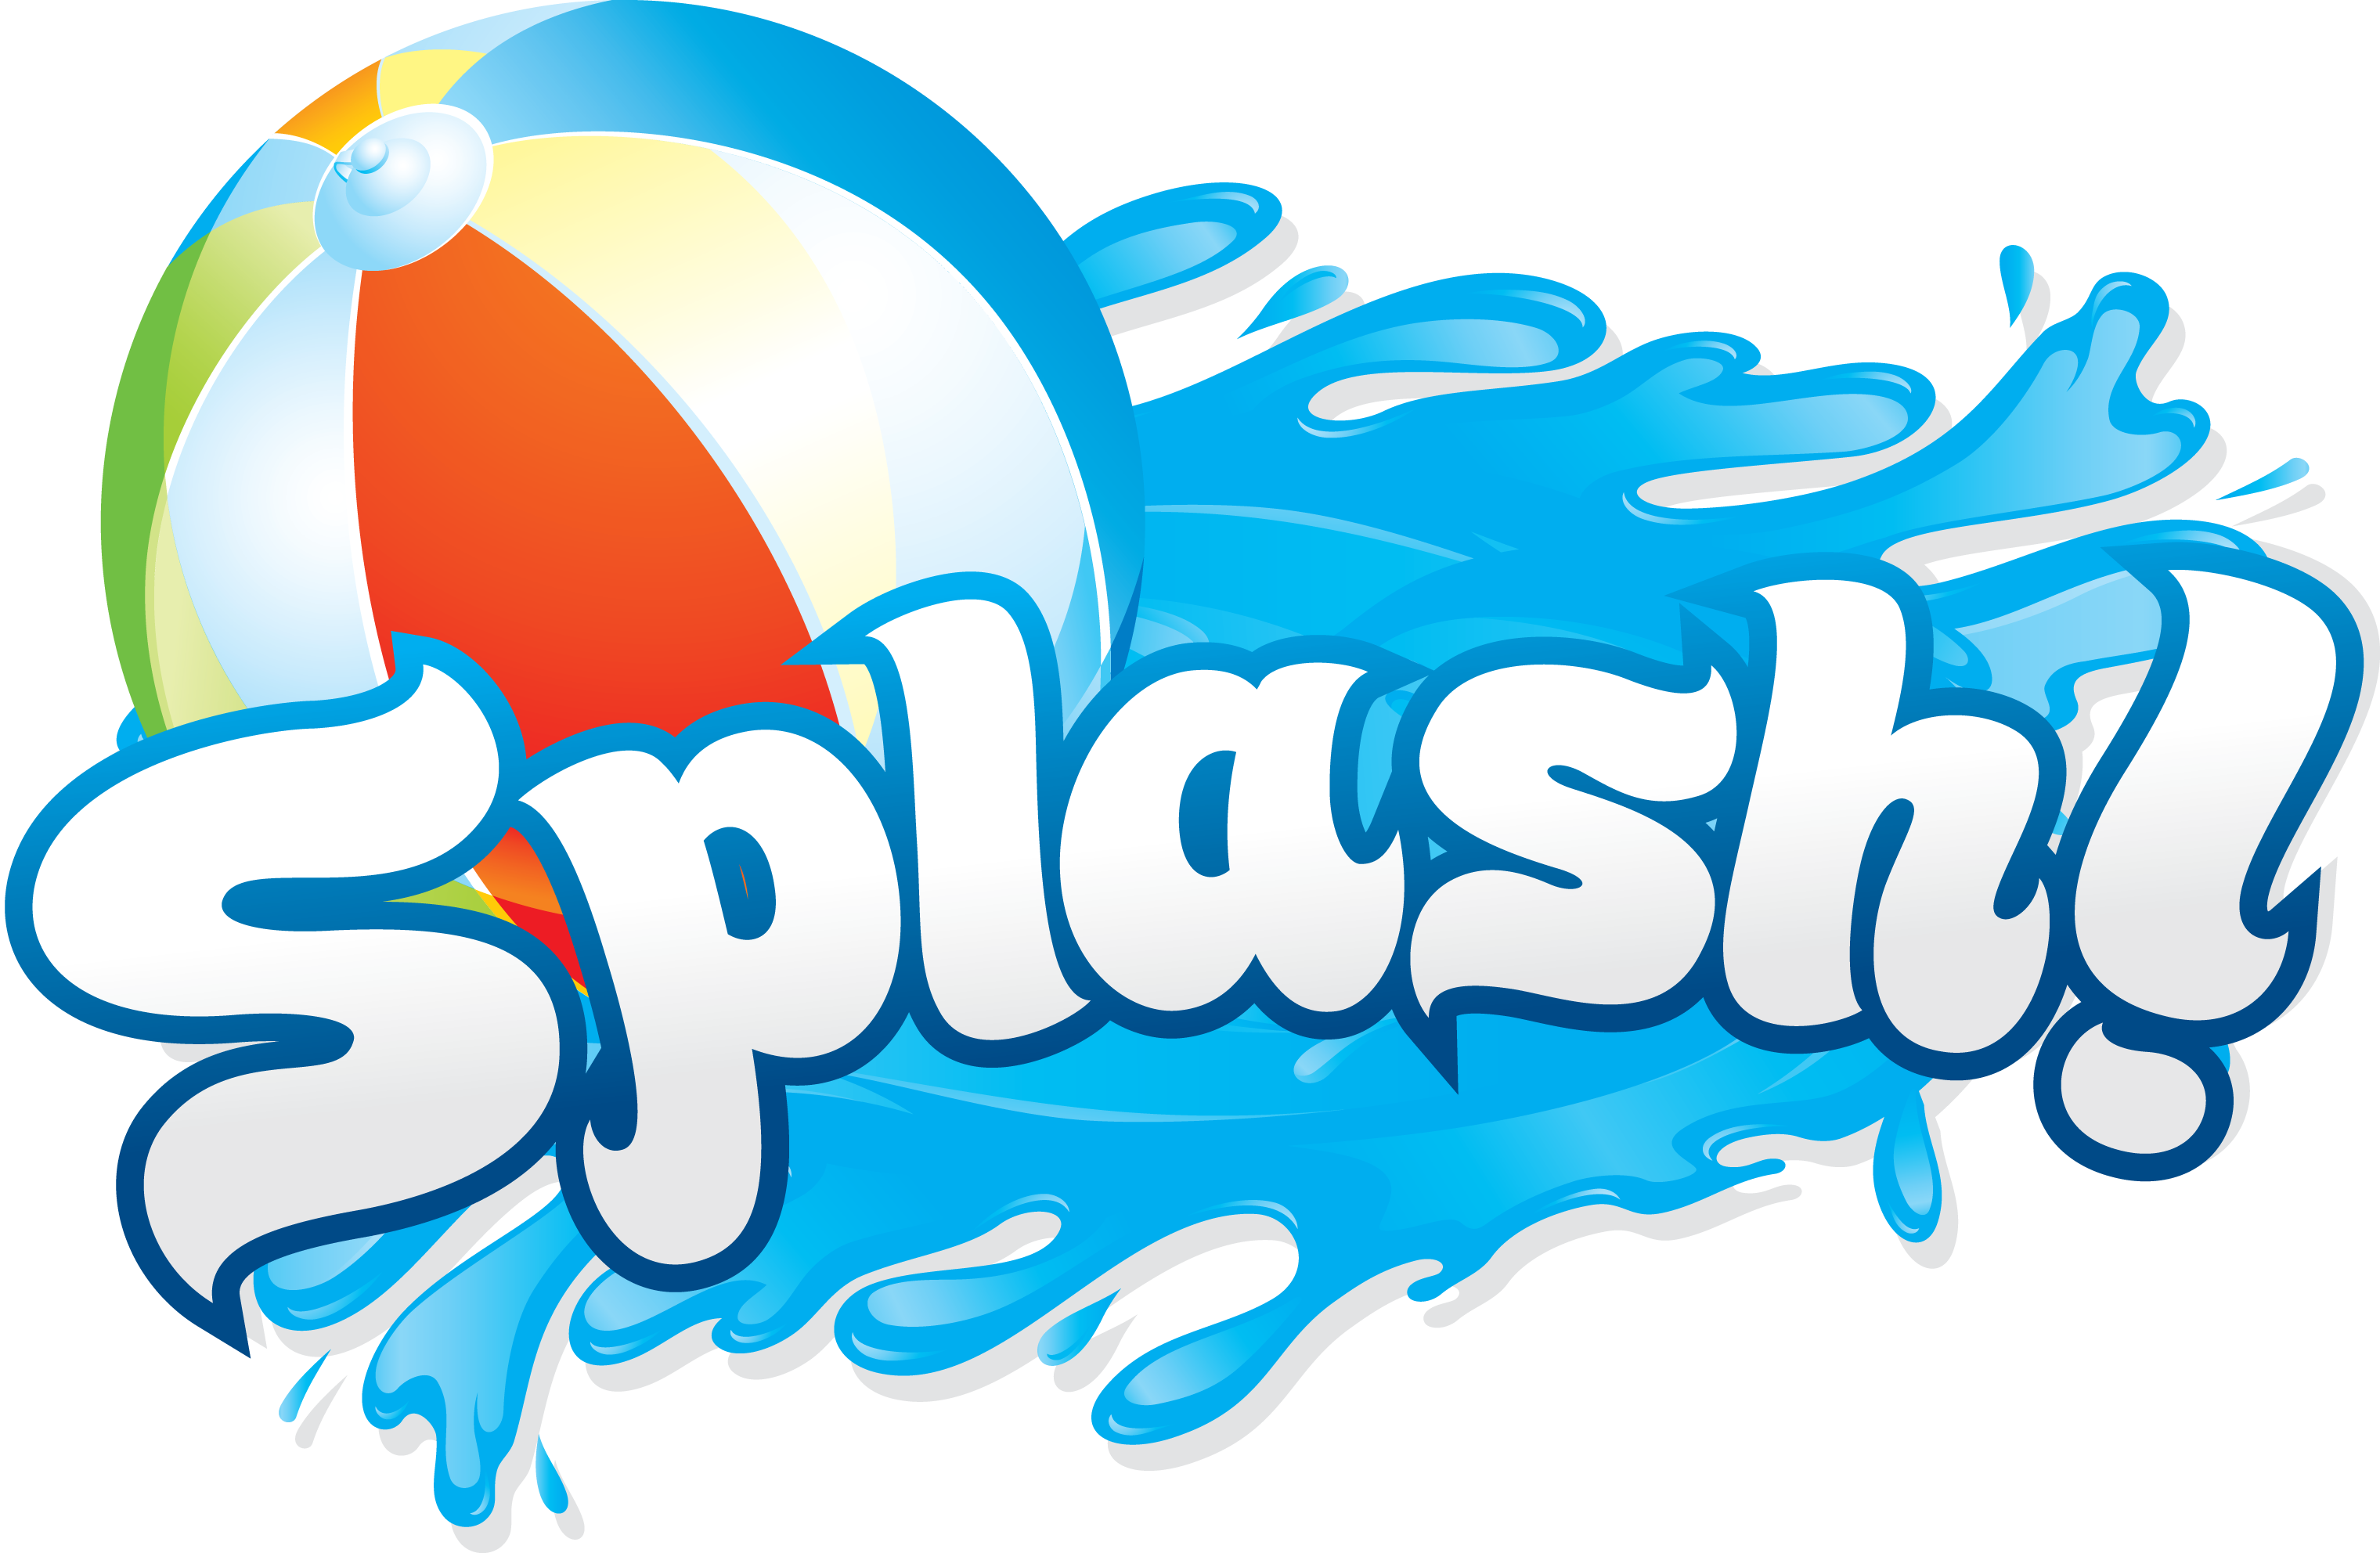 Water Splash Border Clipart Panda Free Clipart Images